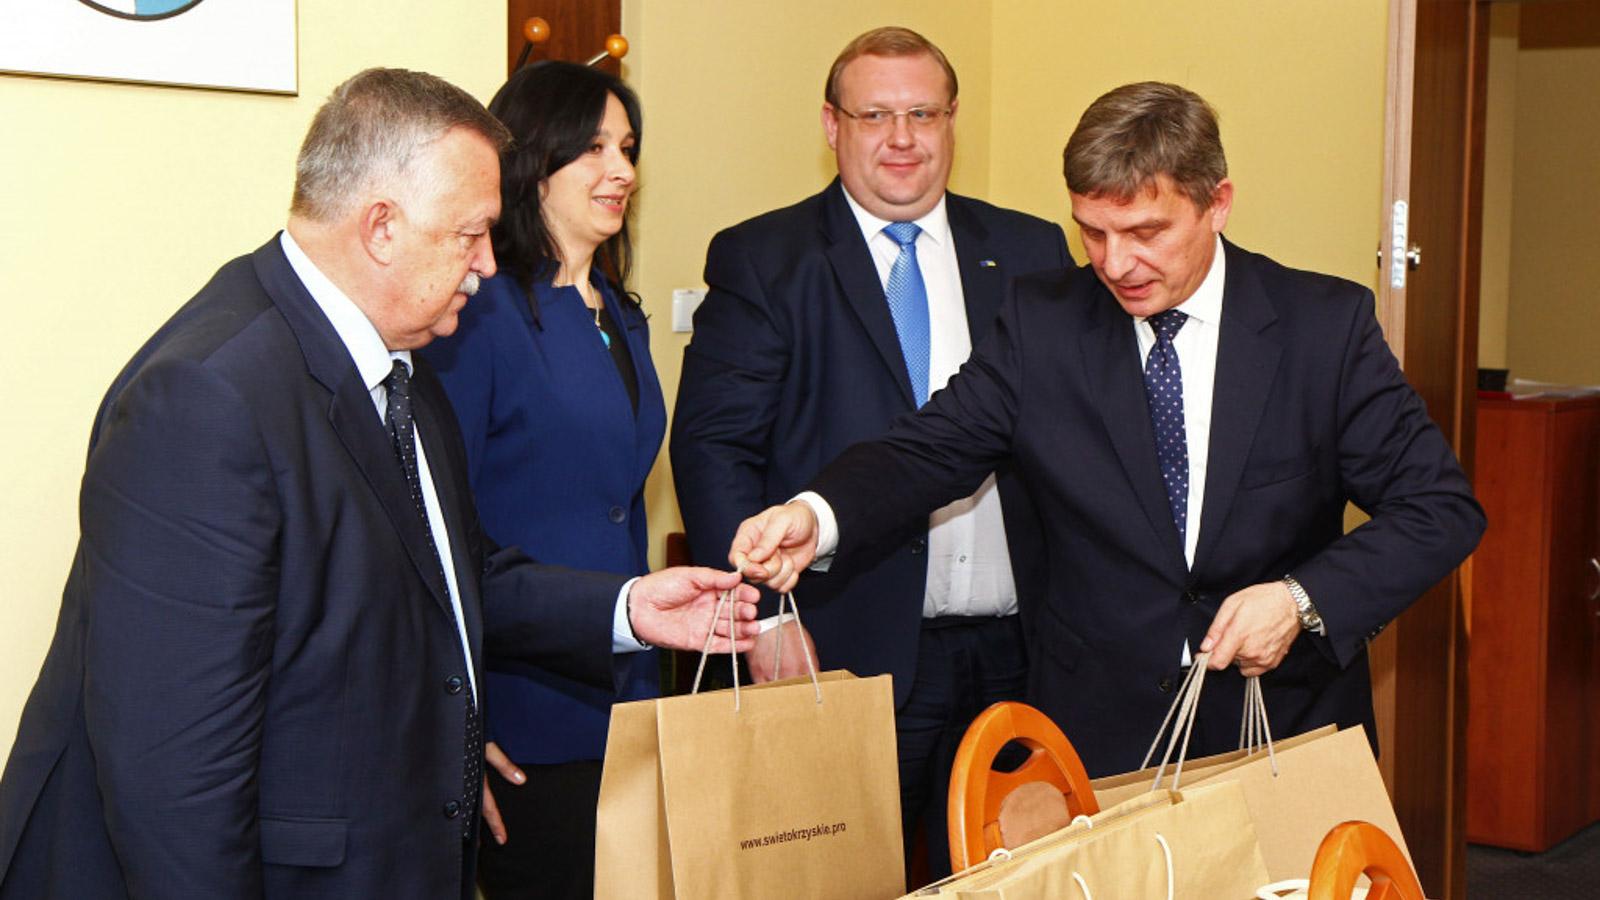 Wizyta-delegacji-z-Ukrainy-9-1024x662